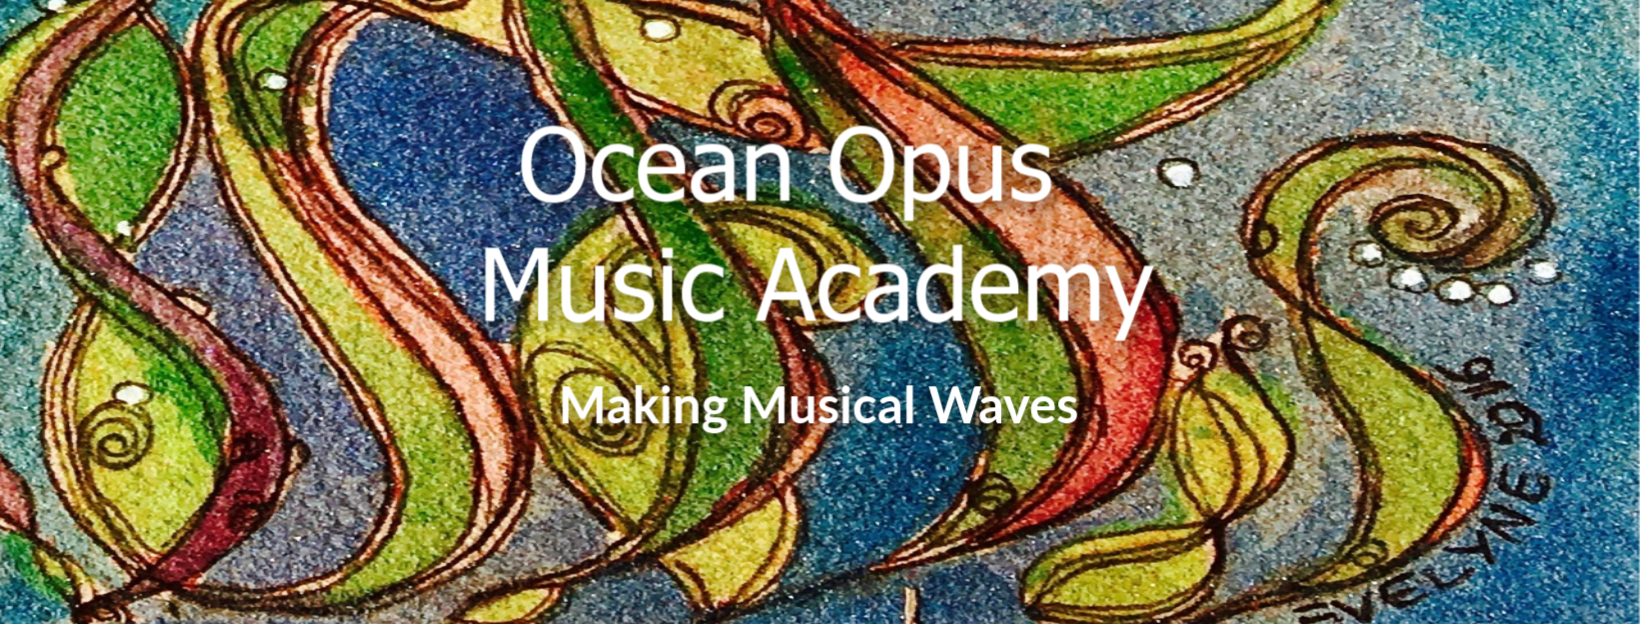 Ocean Opus Music Academy logo